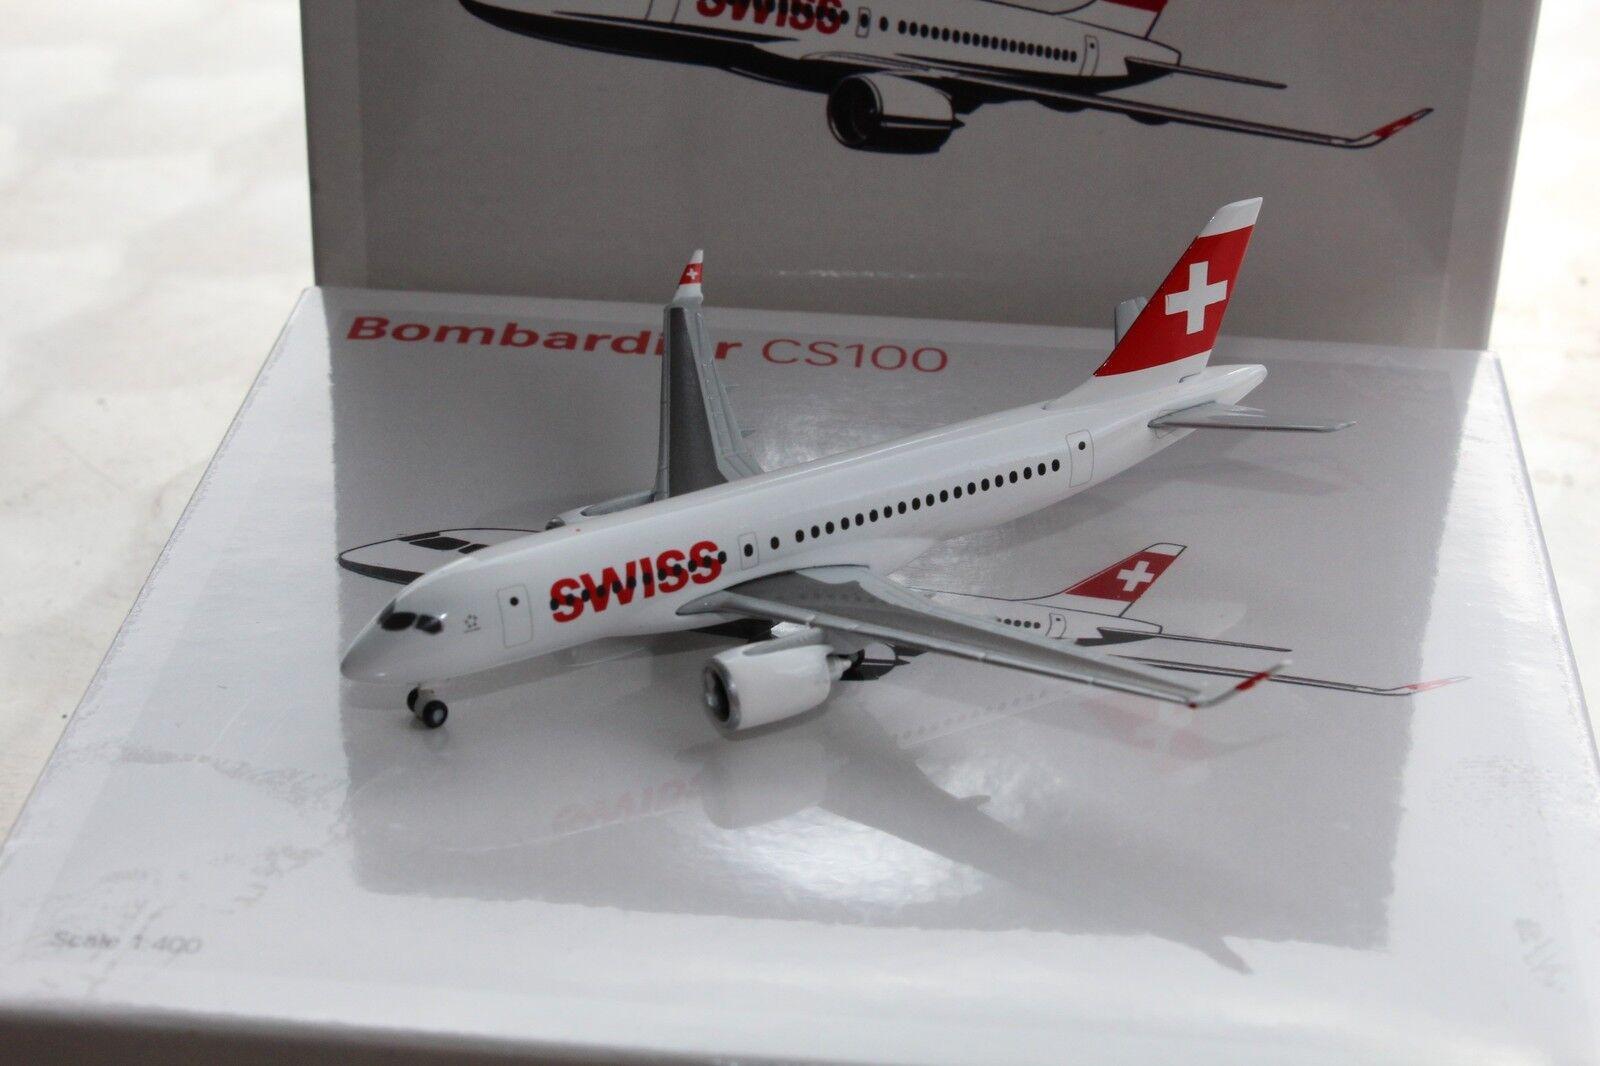 SWISS Bombardier CS100, 1 400, Corporate Modell für Swiss